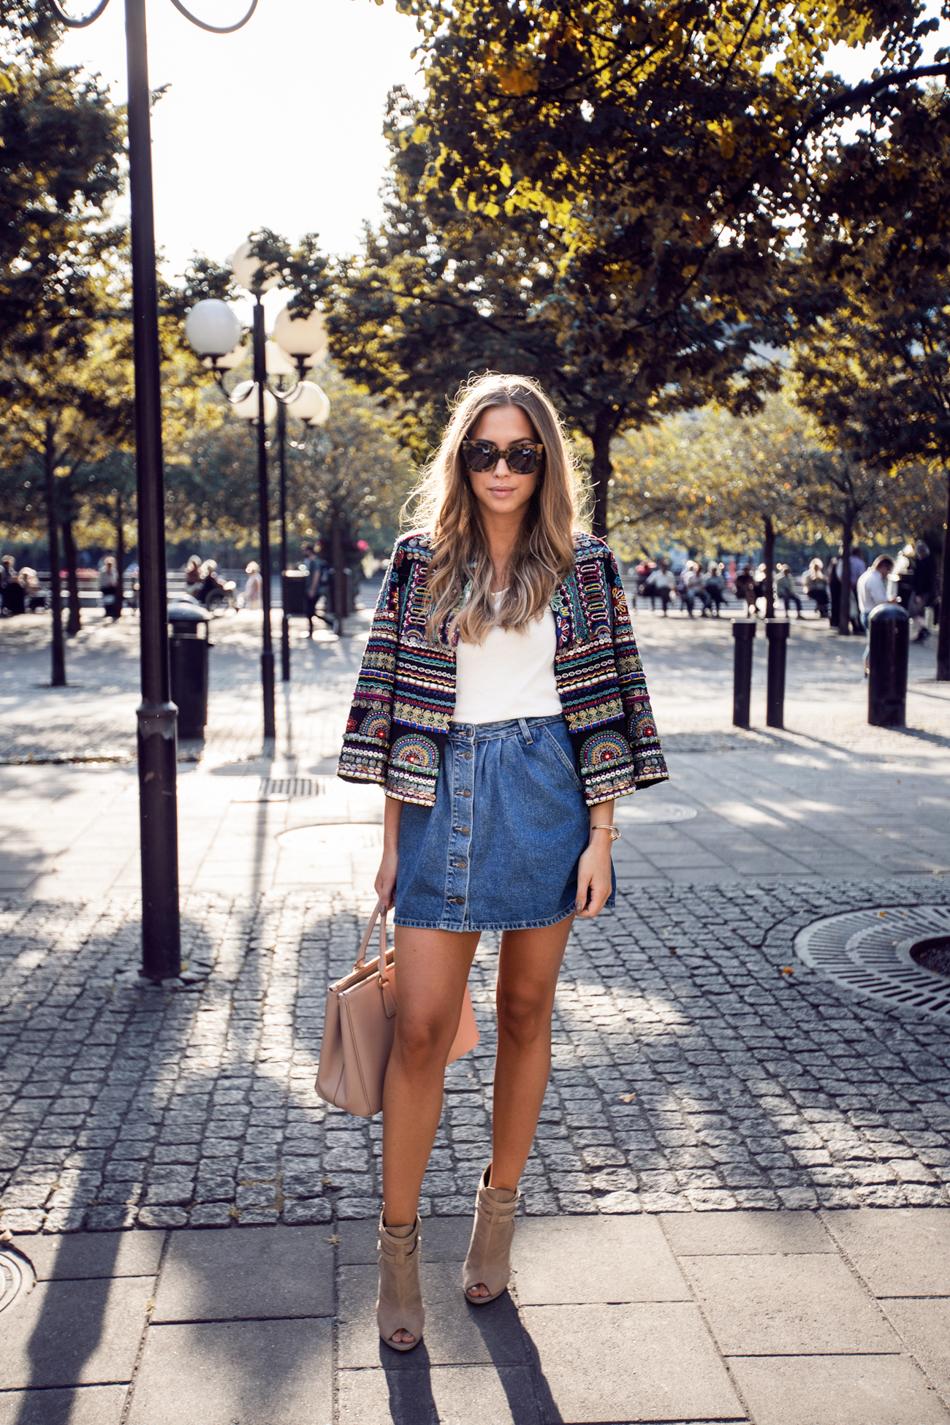 KenzaZouiten_fwday2_outfit_st-1